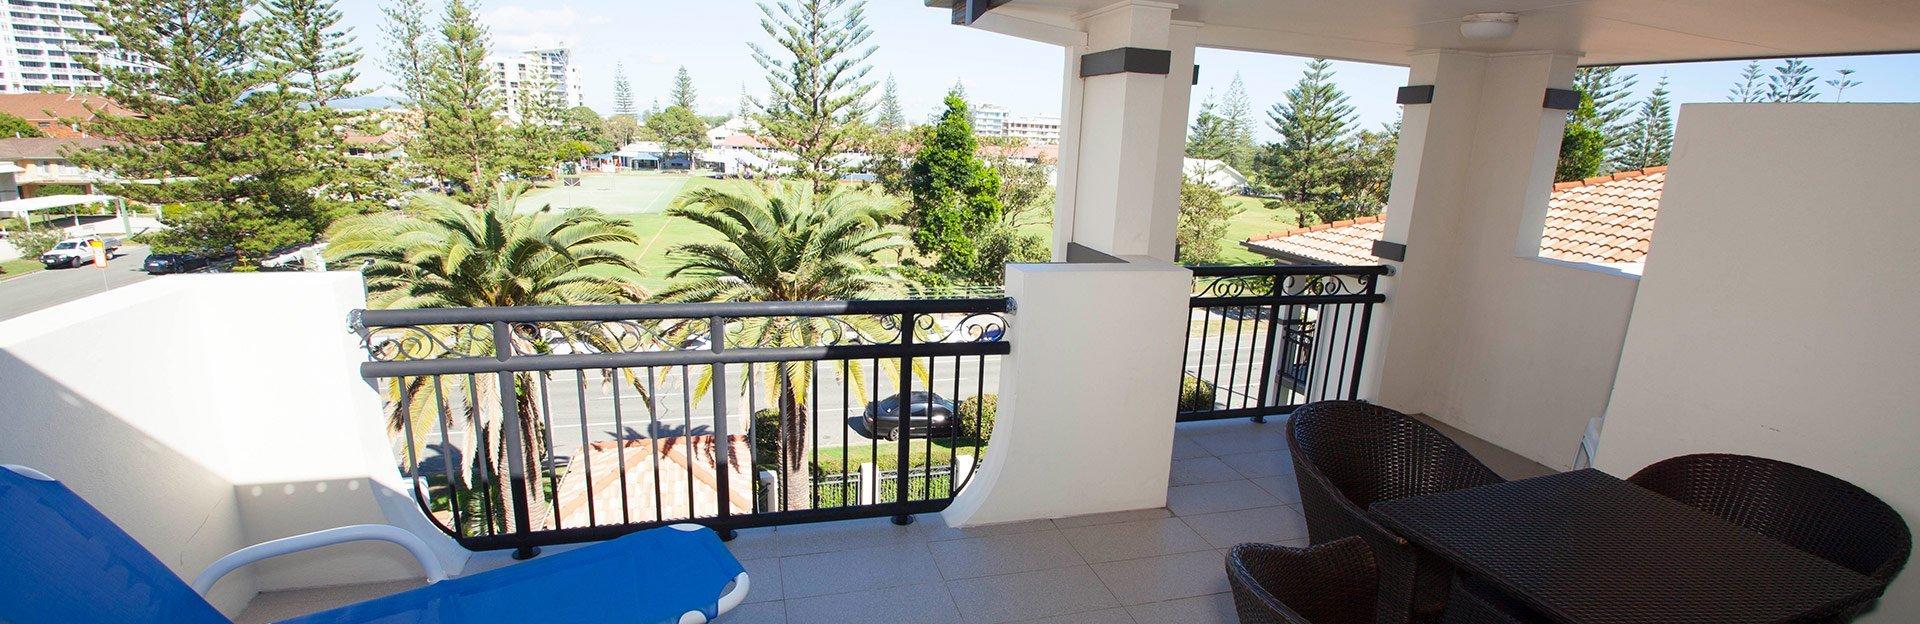 Cheap apartment's balcony in Broadbeach